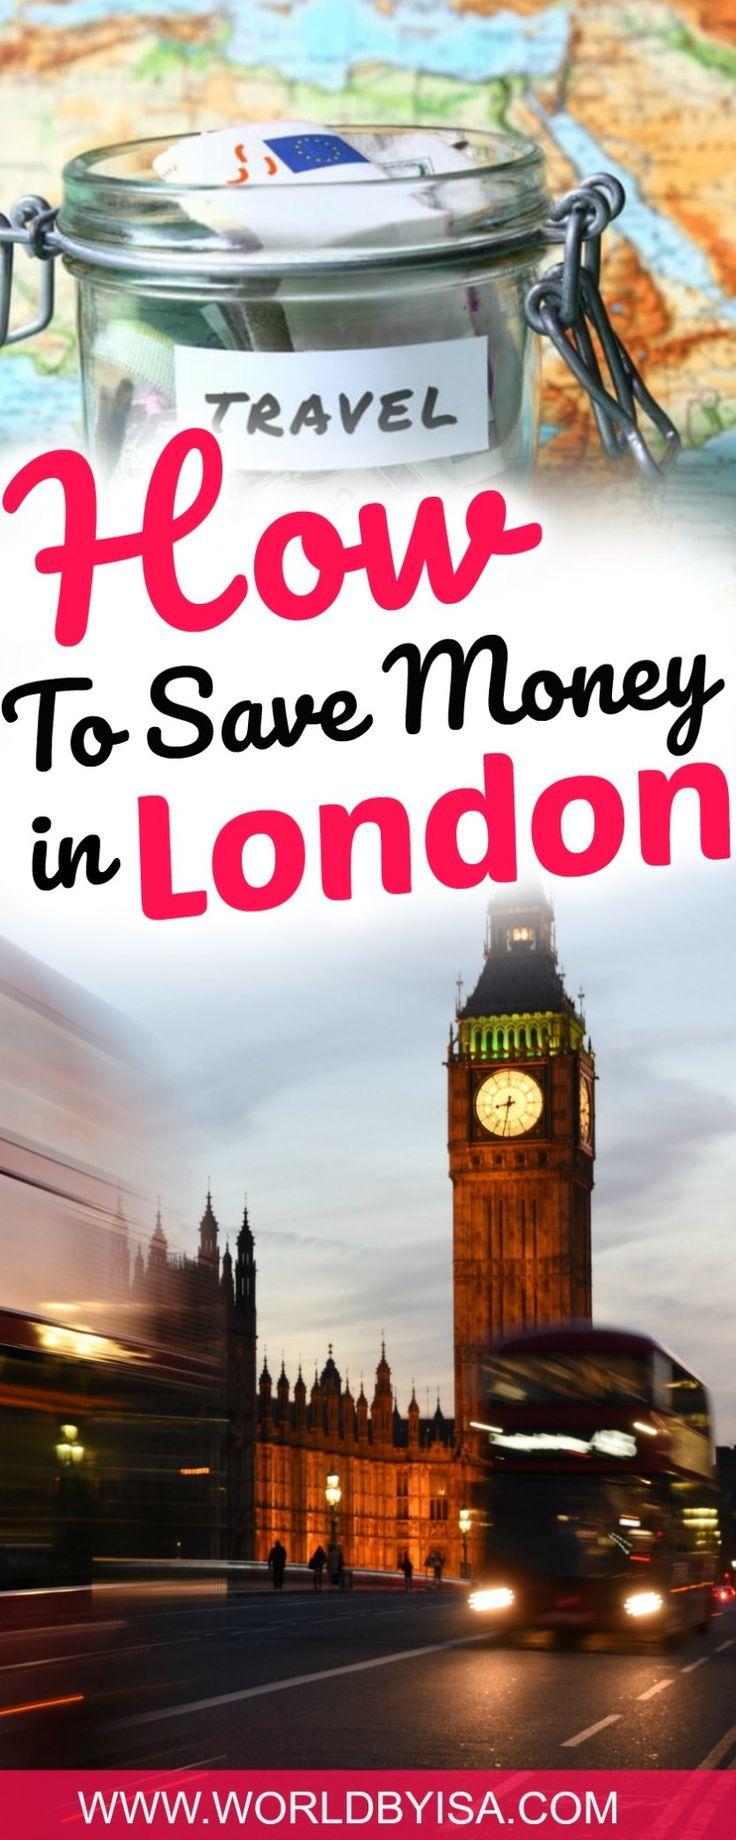 #London #Europe #Travel #Save #Money